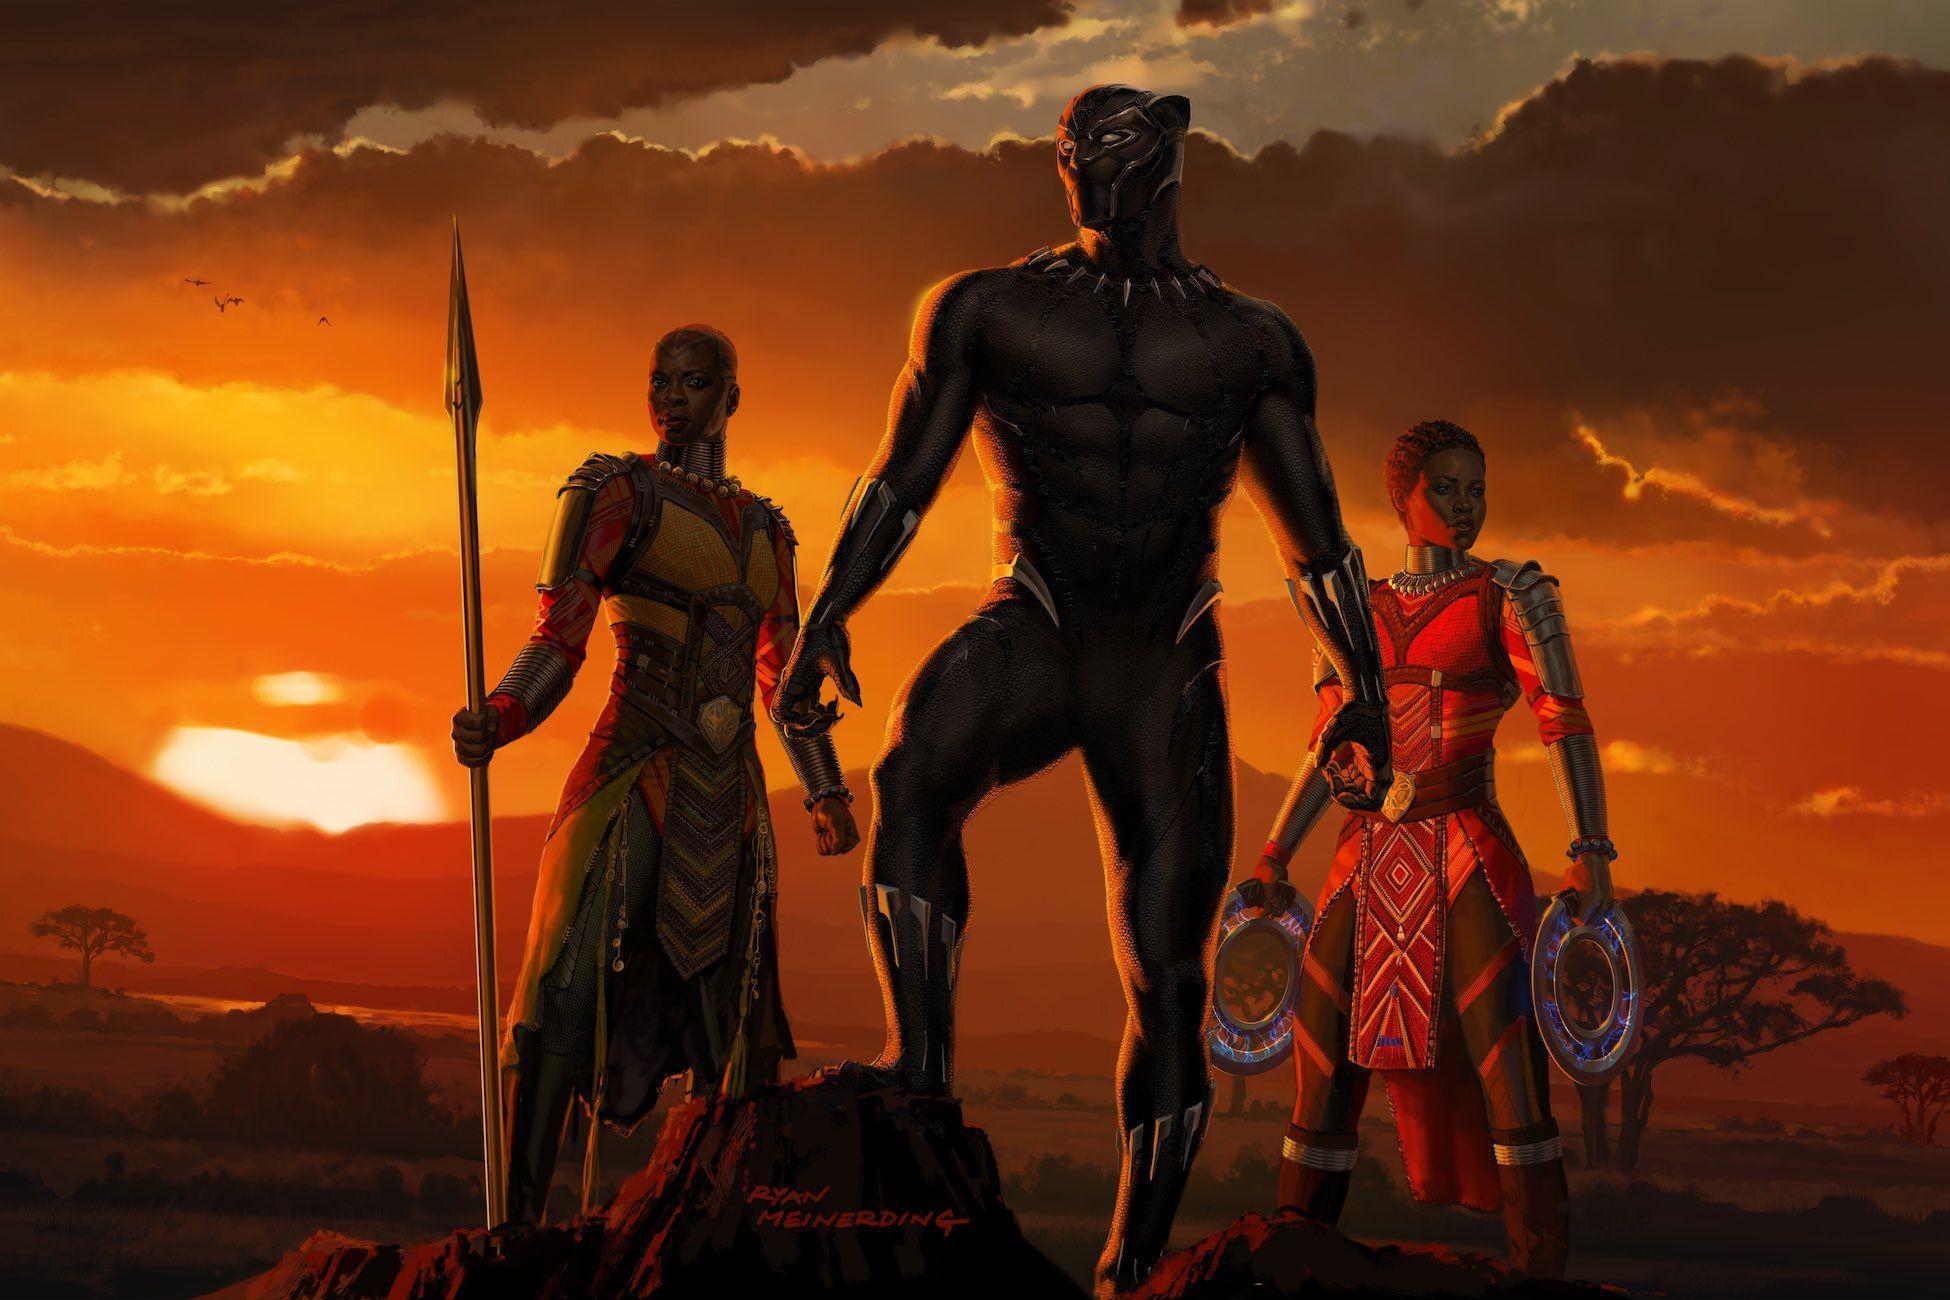 Black Panther Movie Wallpapers Top Free Black Panther Movie Backgrounds Wallpaperaccess